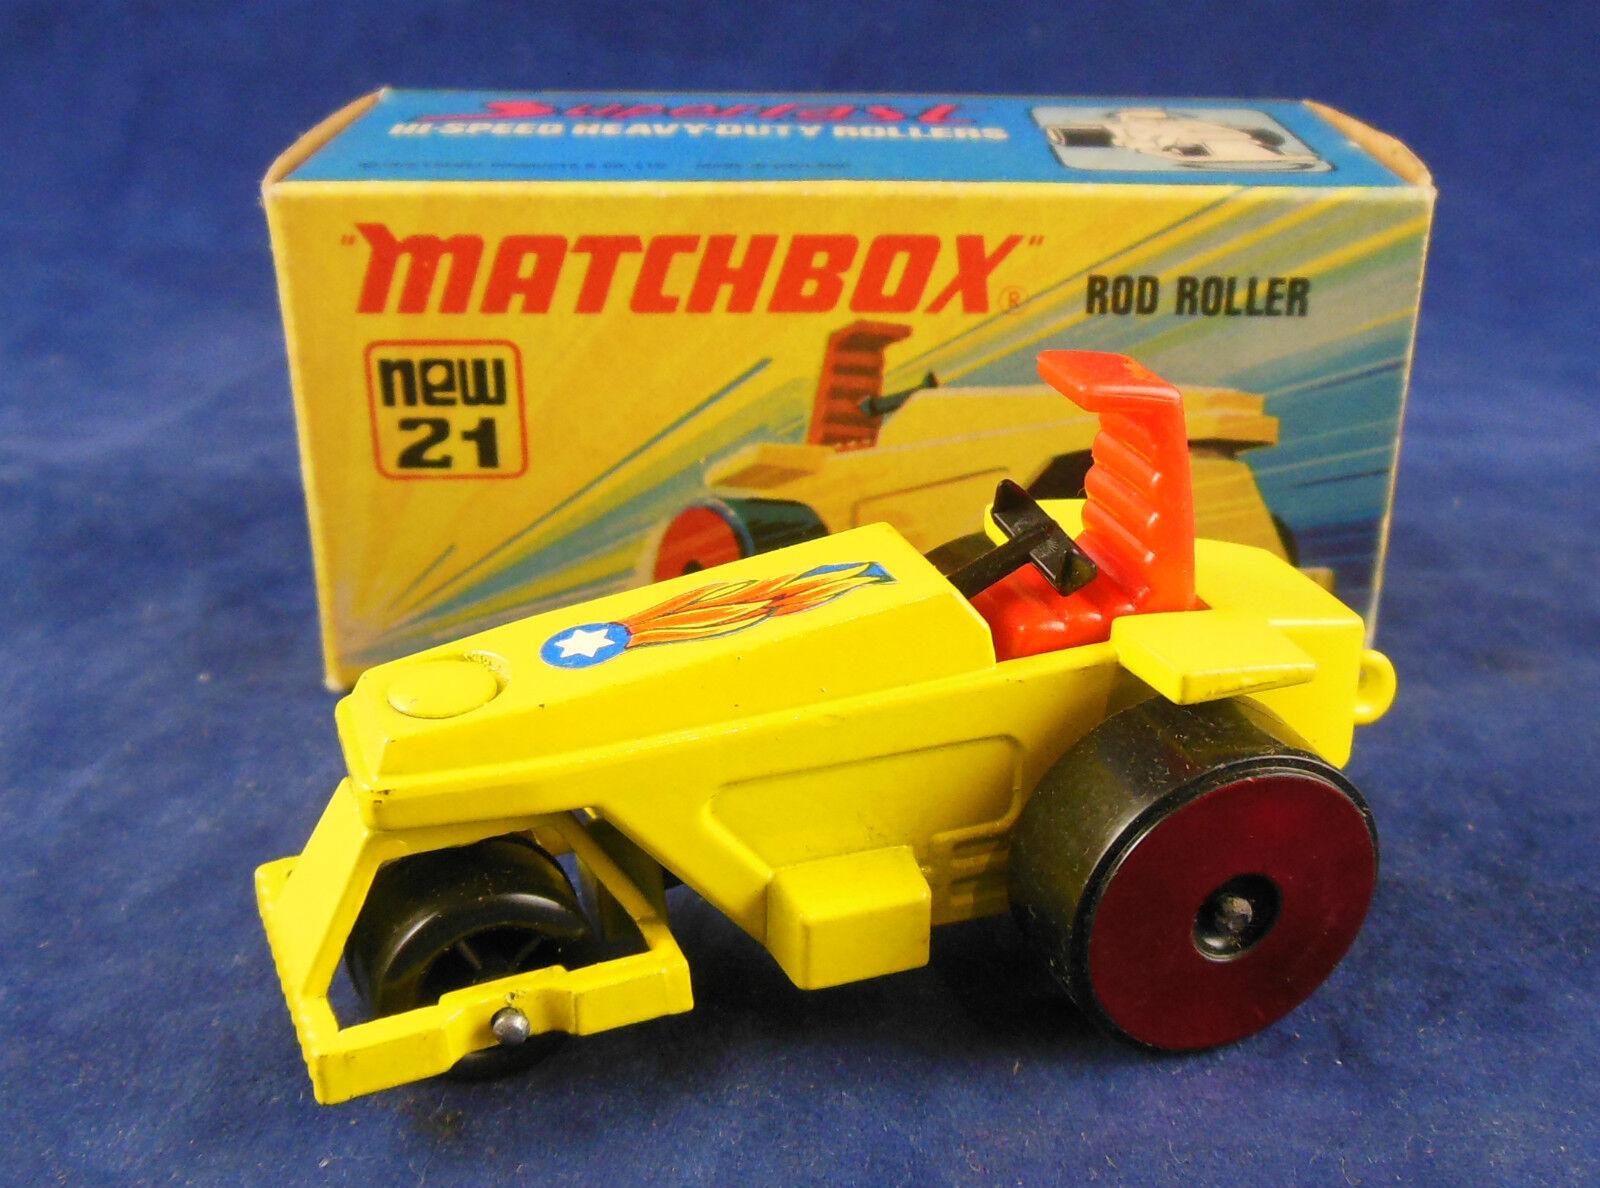 Scarce red wheels wheels wheels Matchbox Superfast No.21b Rod Roller in Yellow  near MIB 786cd1